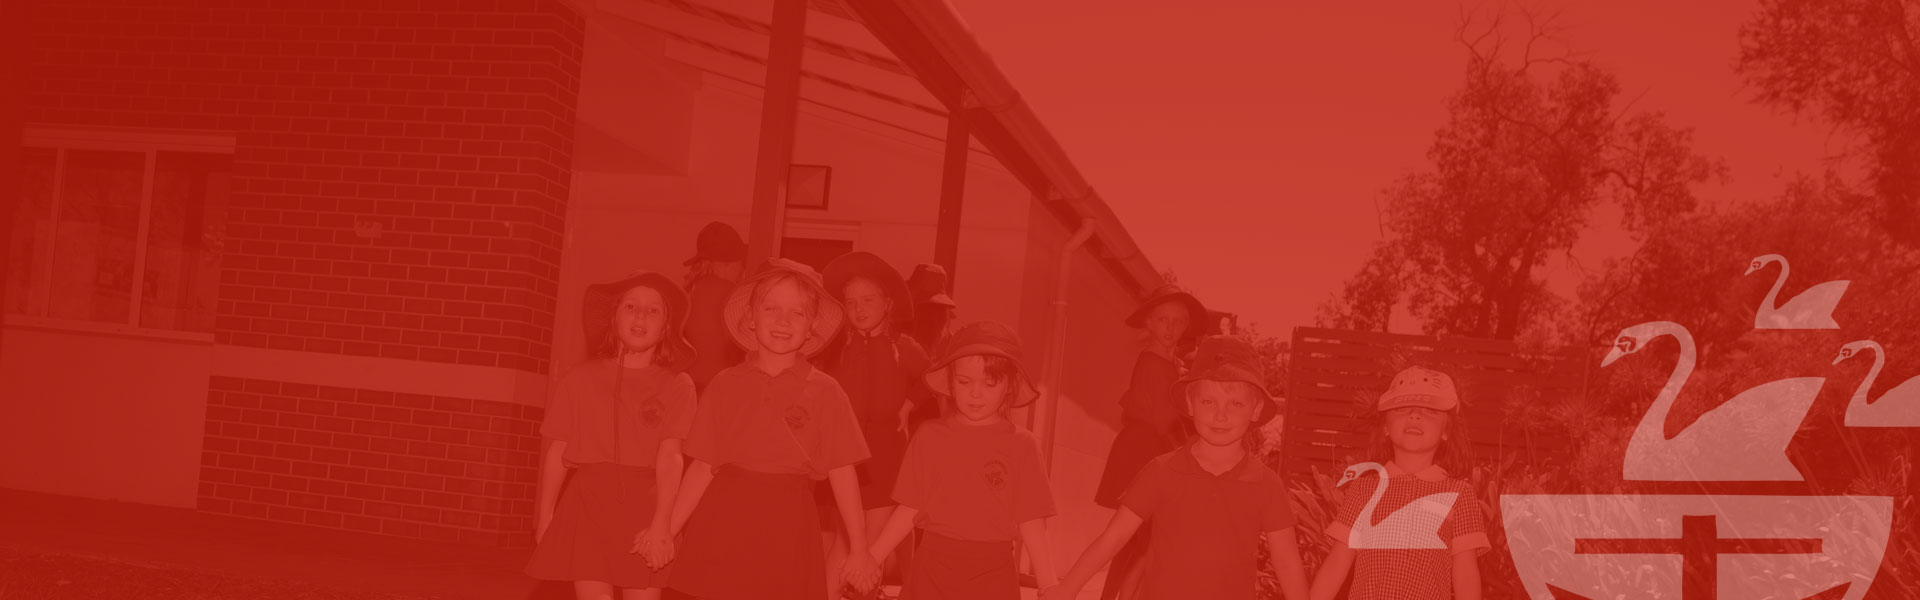 Guildford Primary School